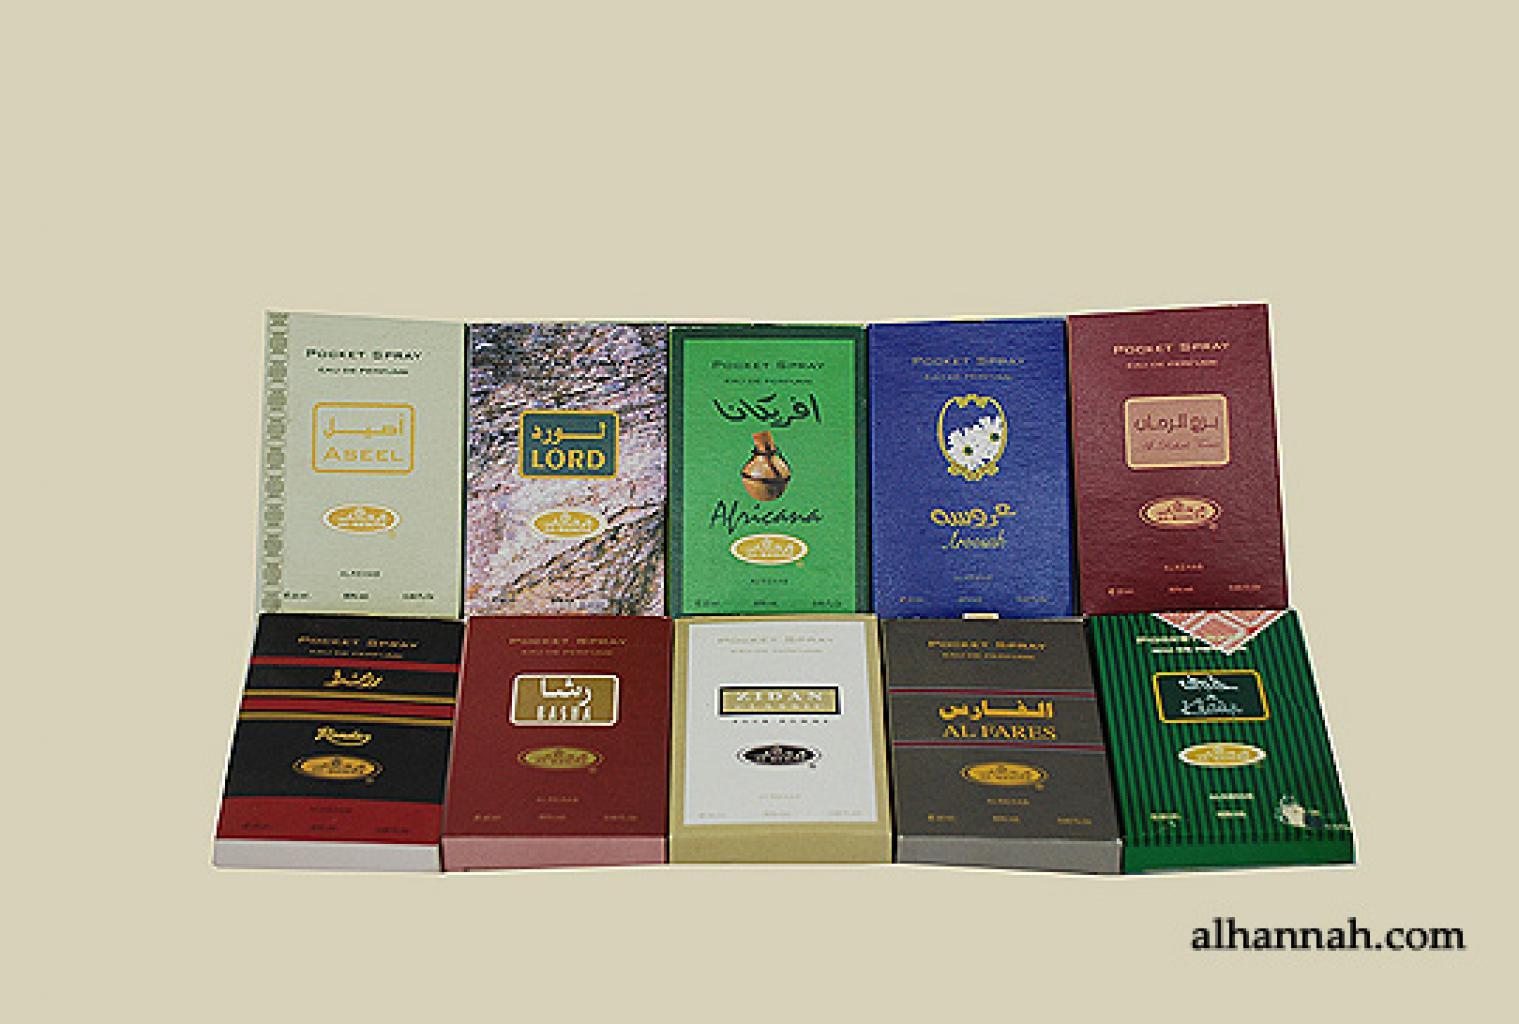 Al Rehab Pocket Spray Perfume in286